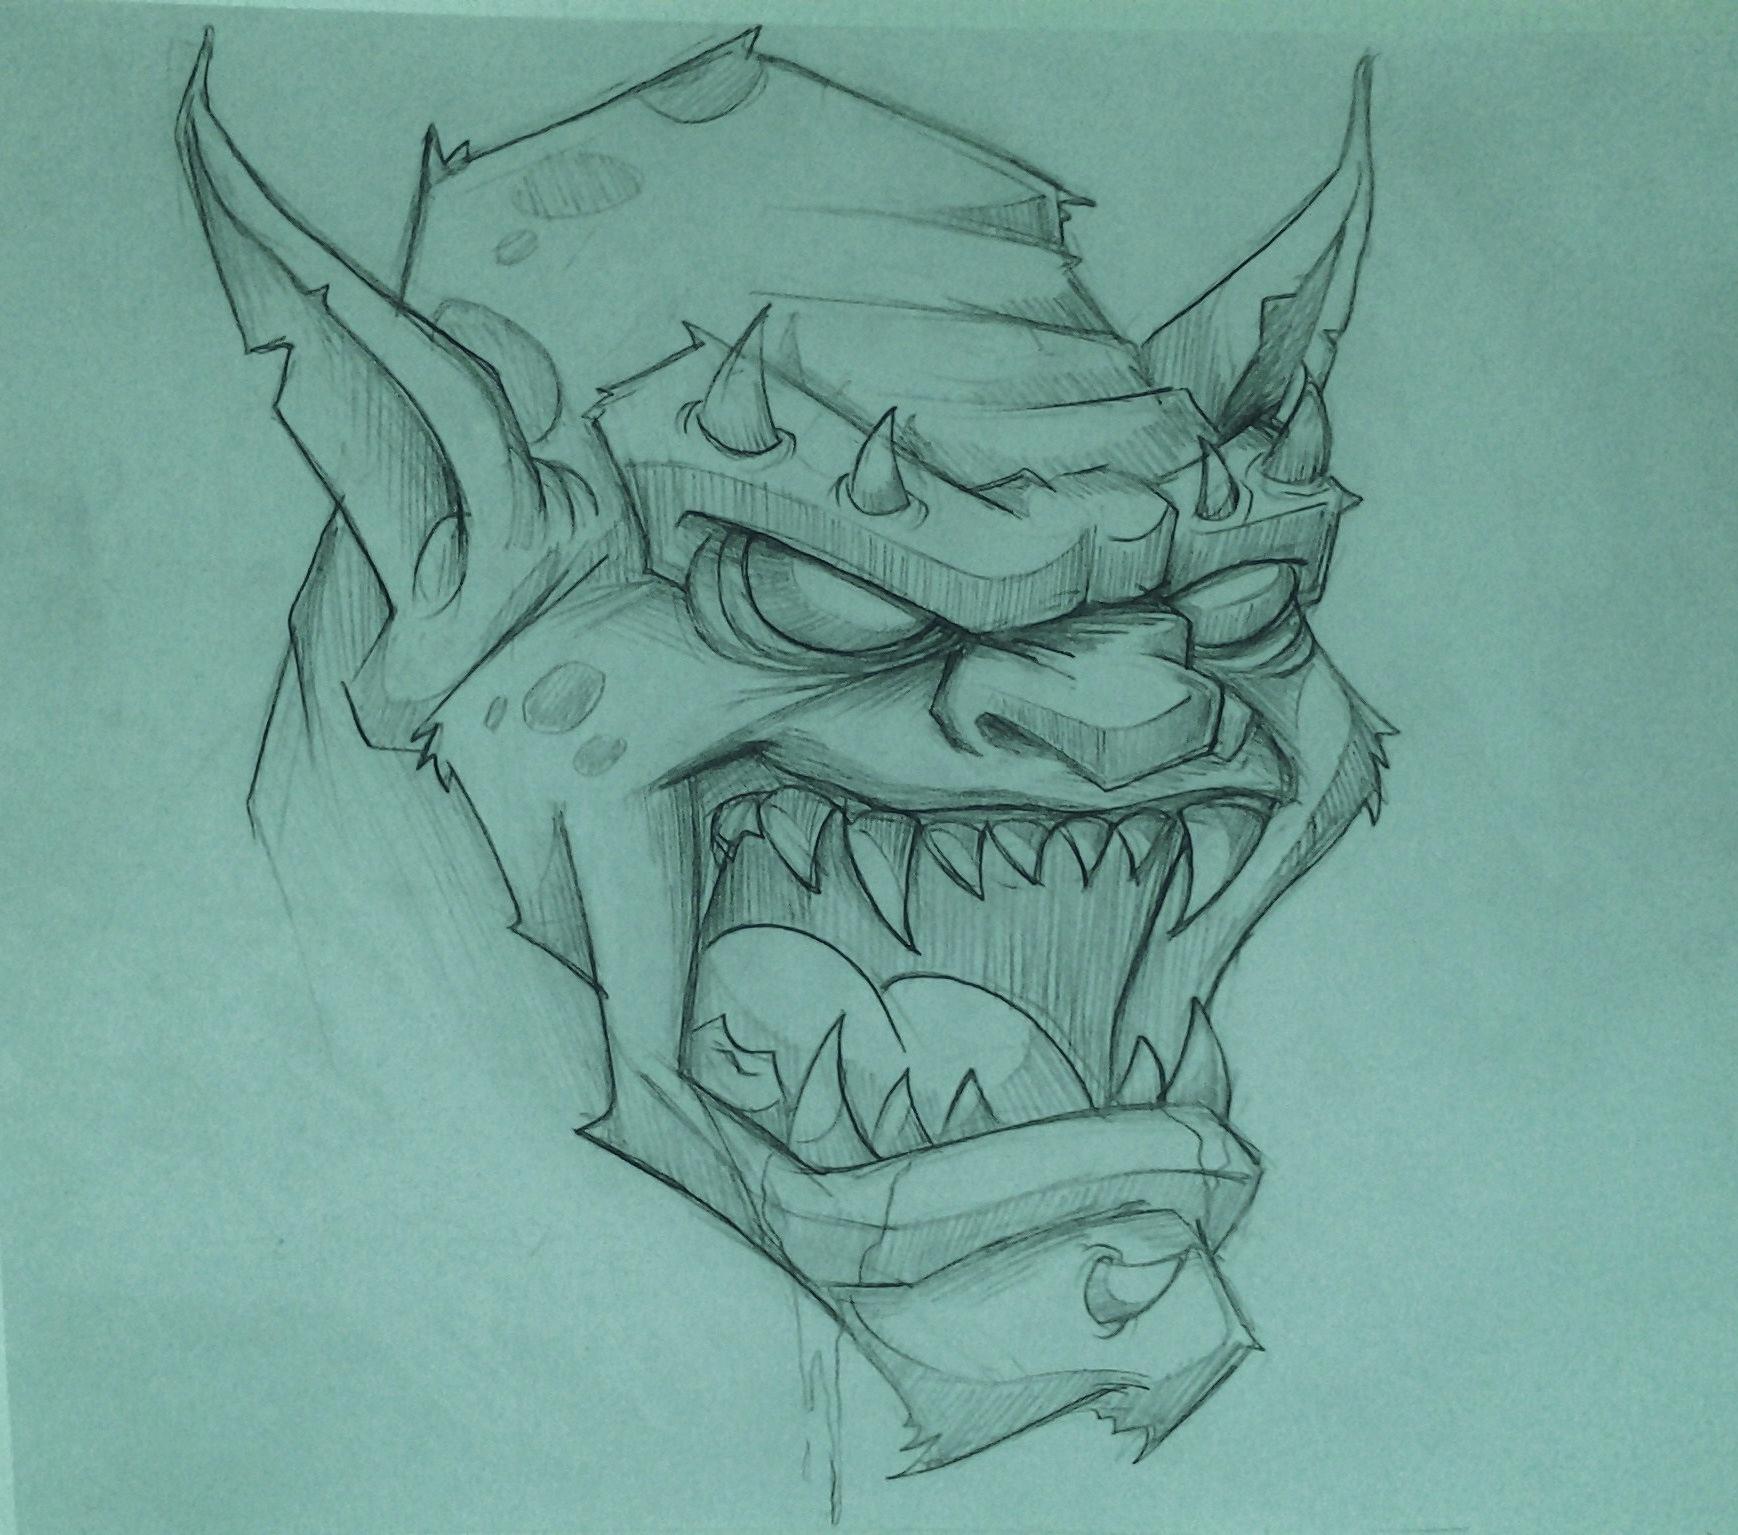 1738x1535 Pencil Drawings Of Monsters